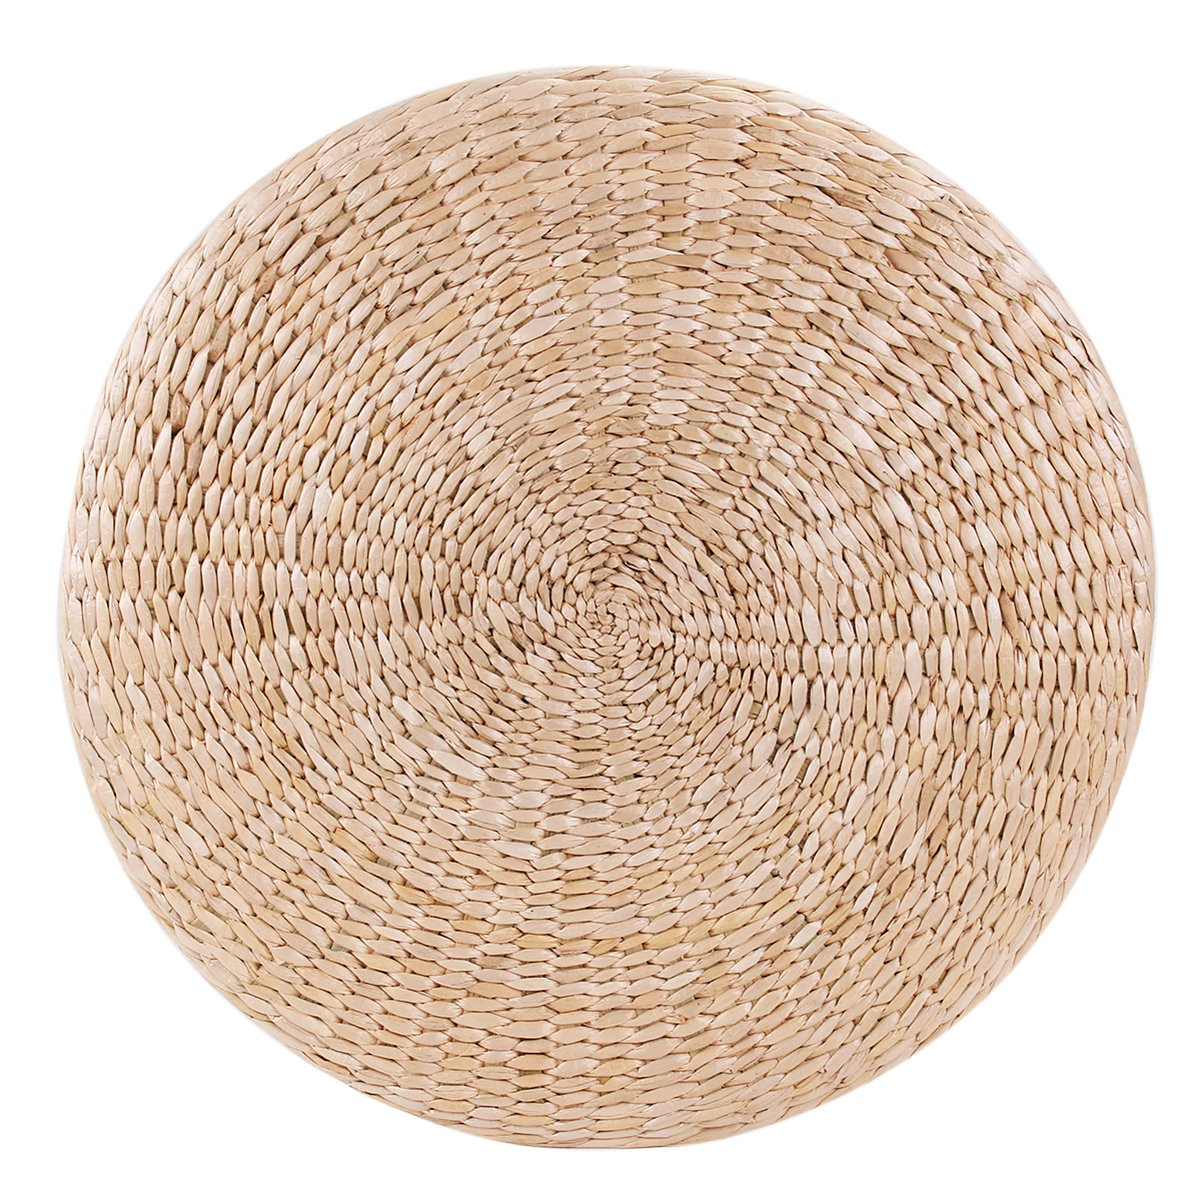 KINGSO Handcrafted Straw Round Pouf Tatami Cushion Floor Cushions Natural Straw Meditation Yoga Mat Chair Seat Cushion (50 x 6cm)